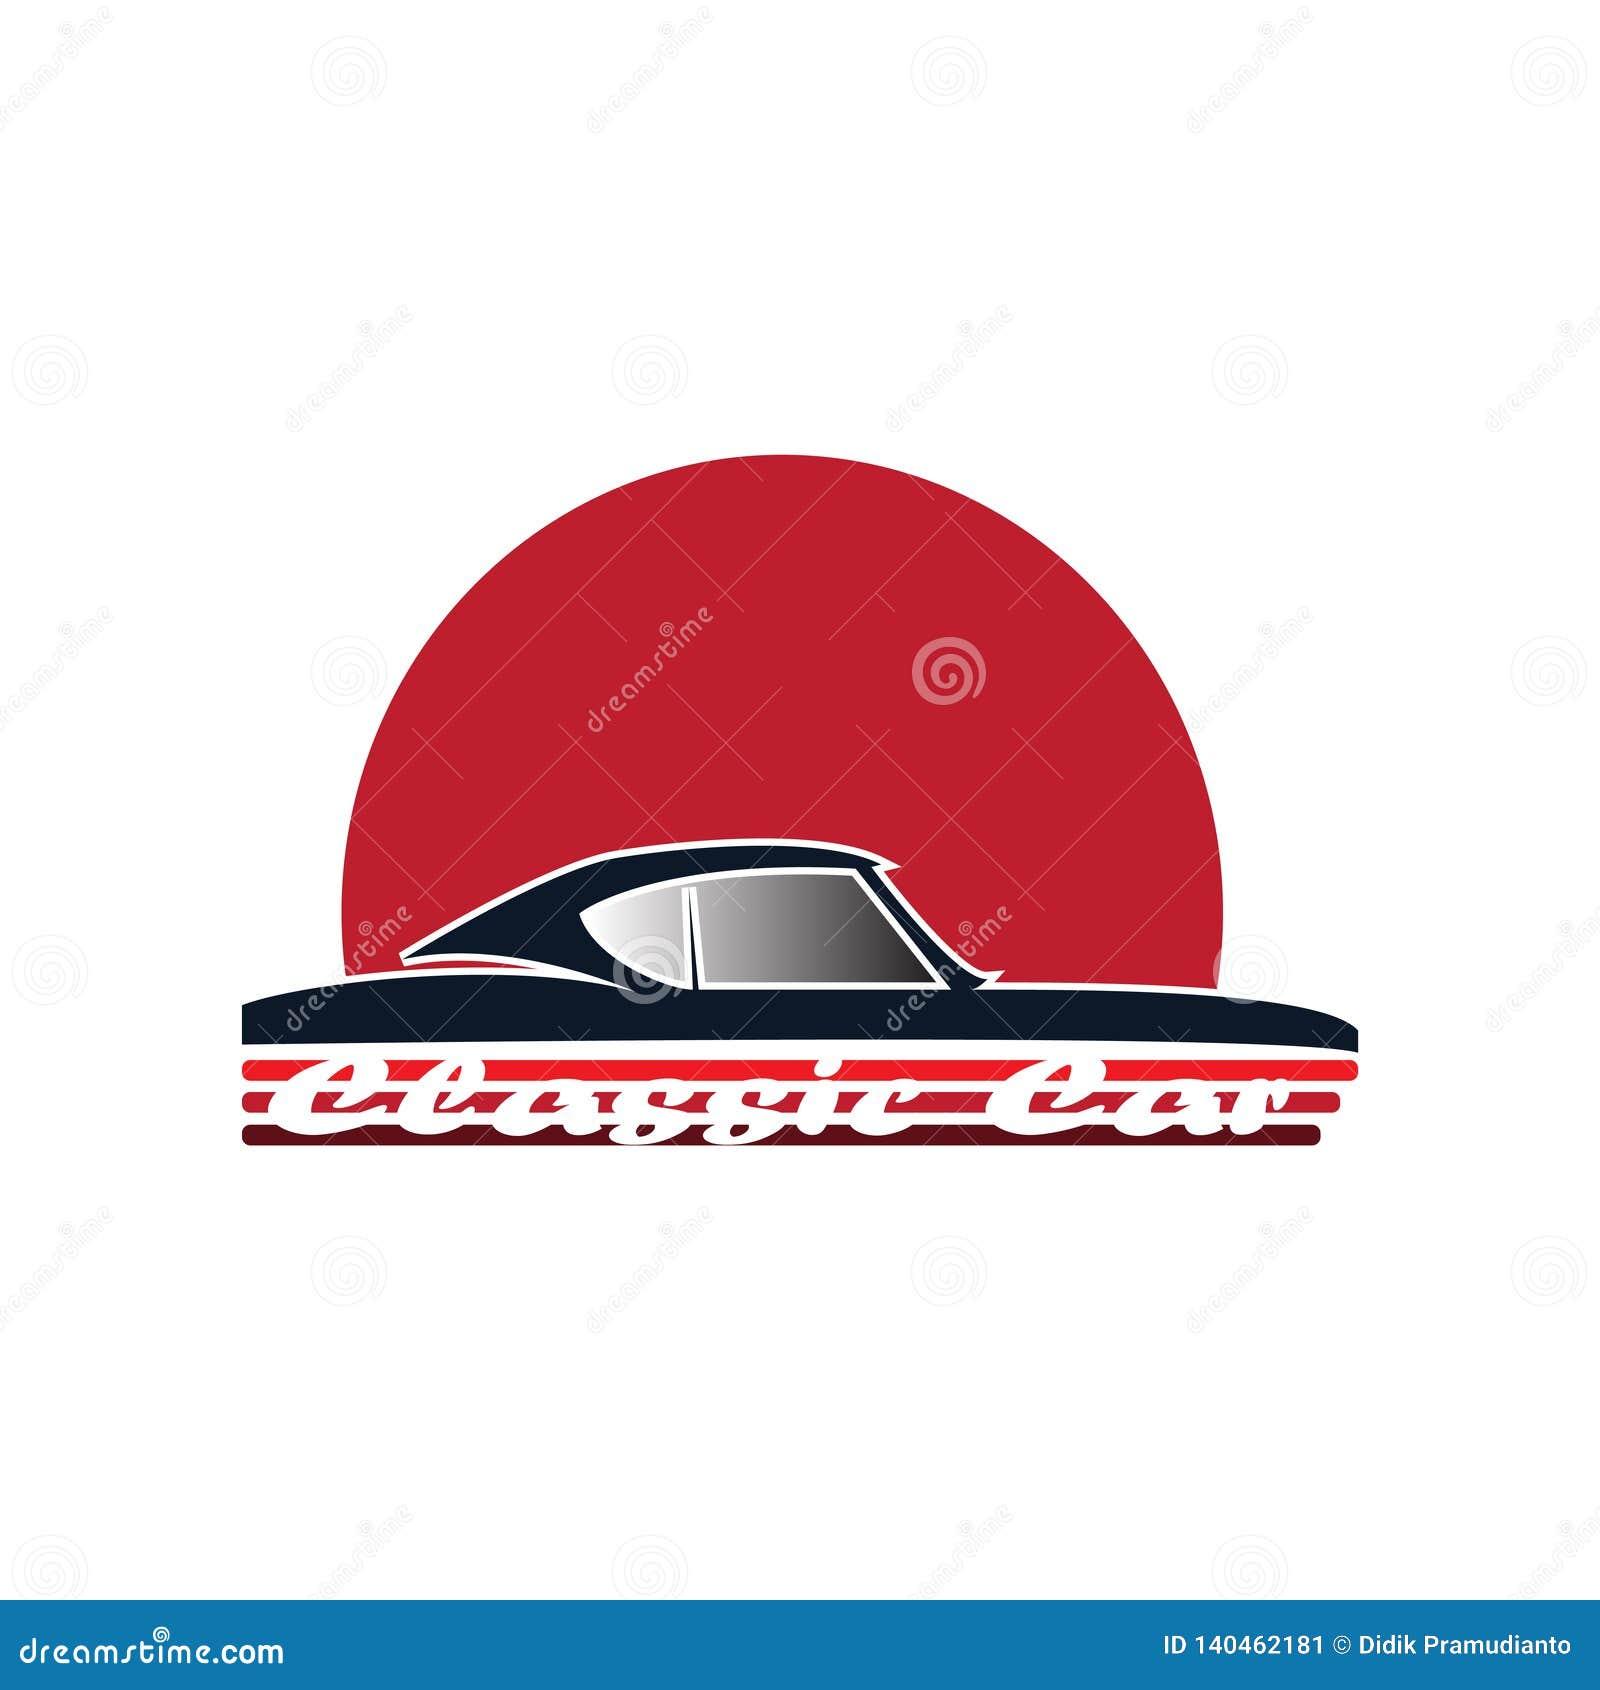 Classic car logo for classic car club